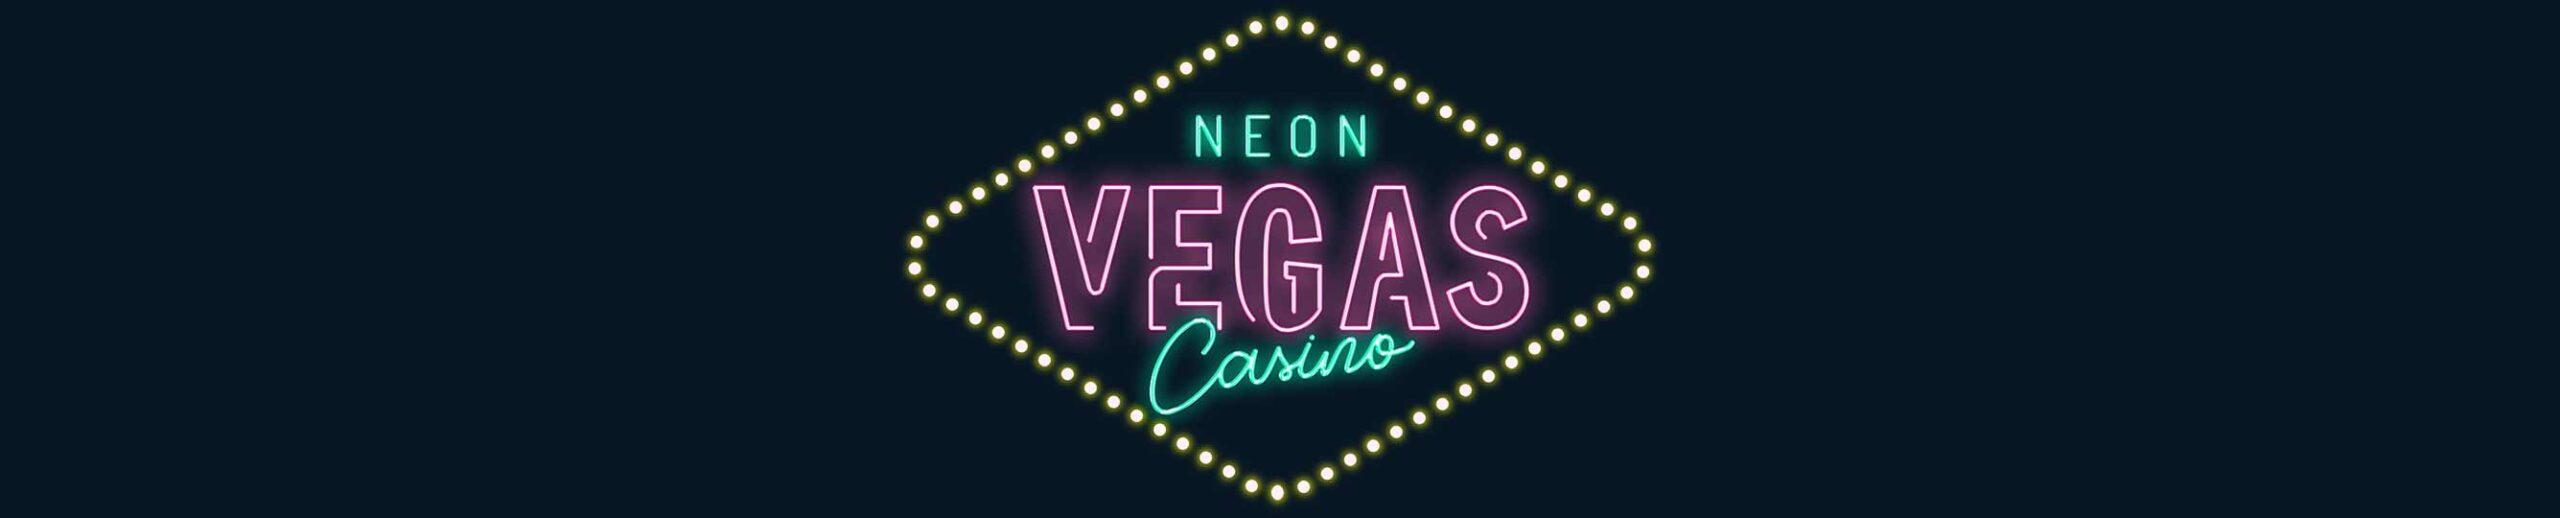 Neon Vegas Casino Test